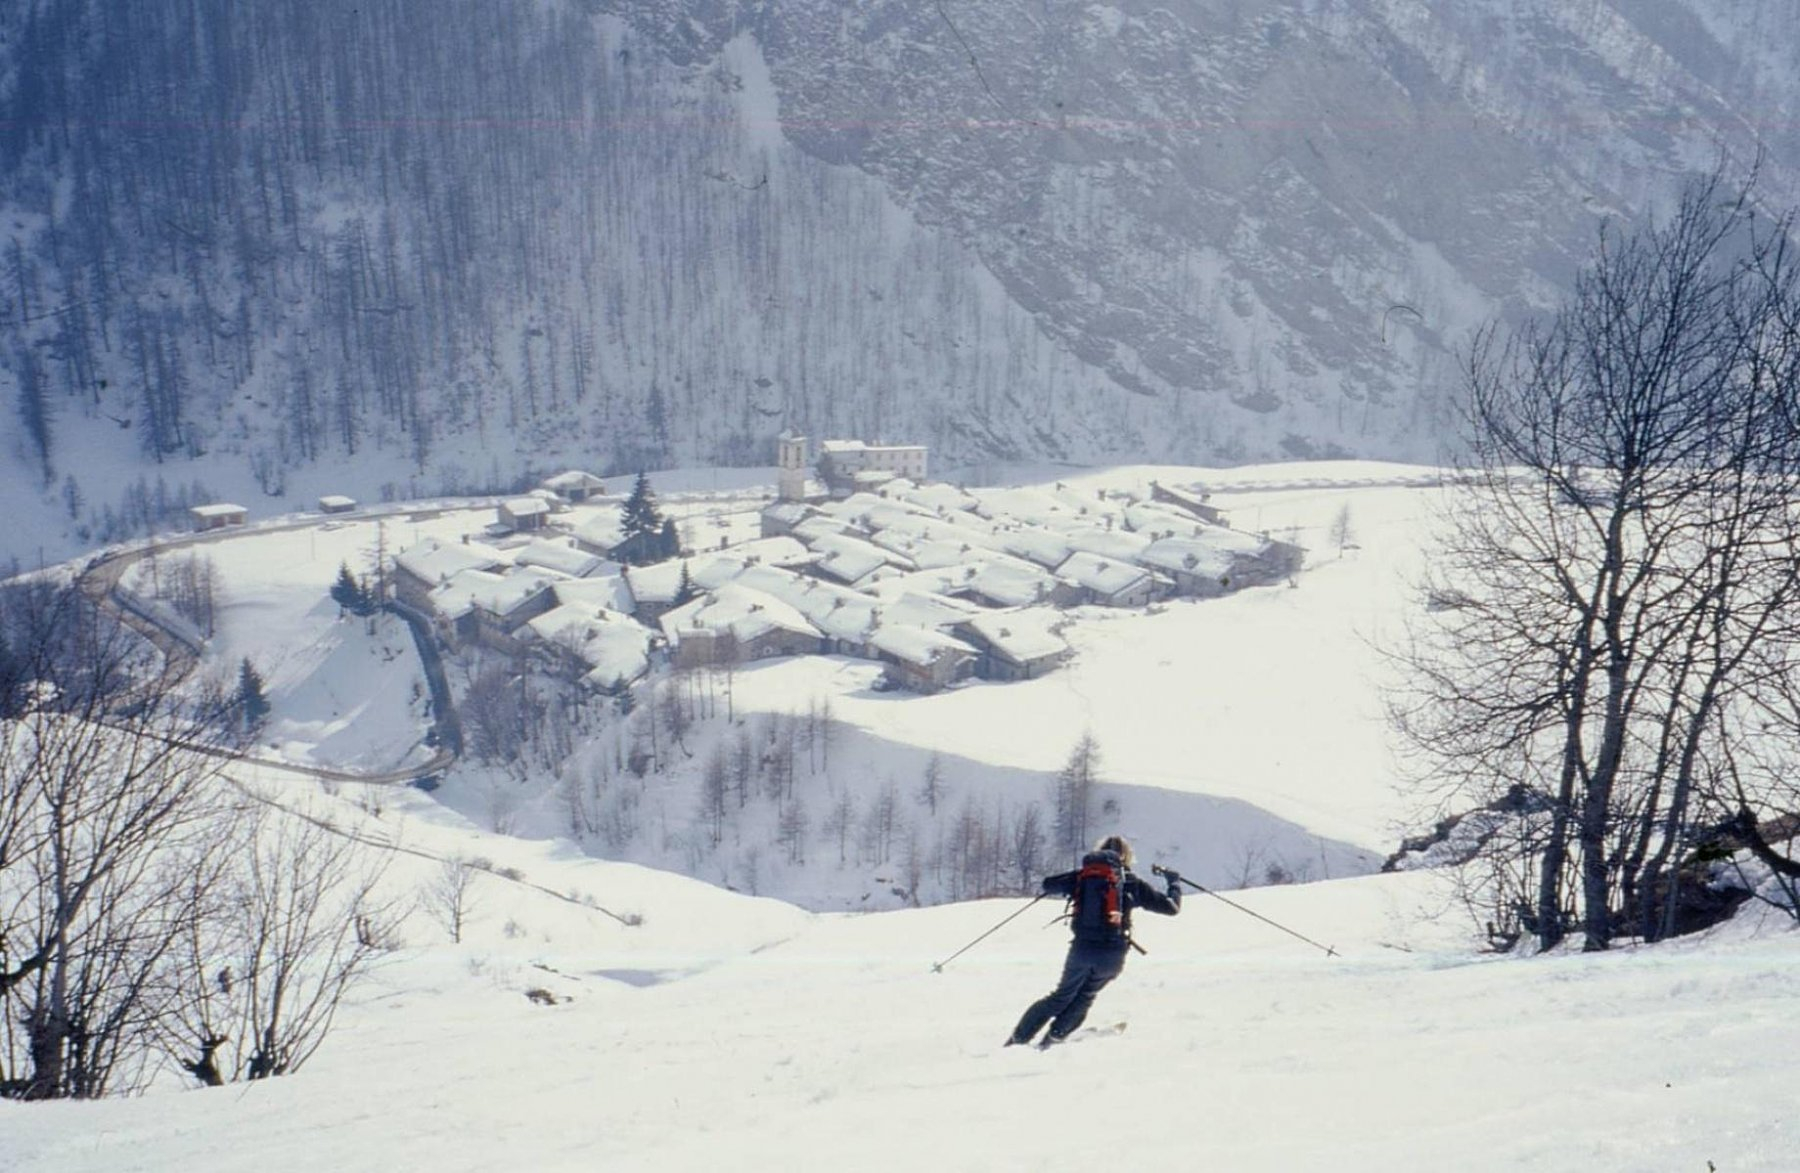 Bondormir (Cima del) da Prafauchier 2003-02-22